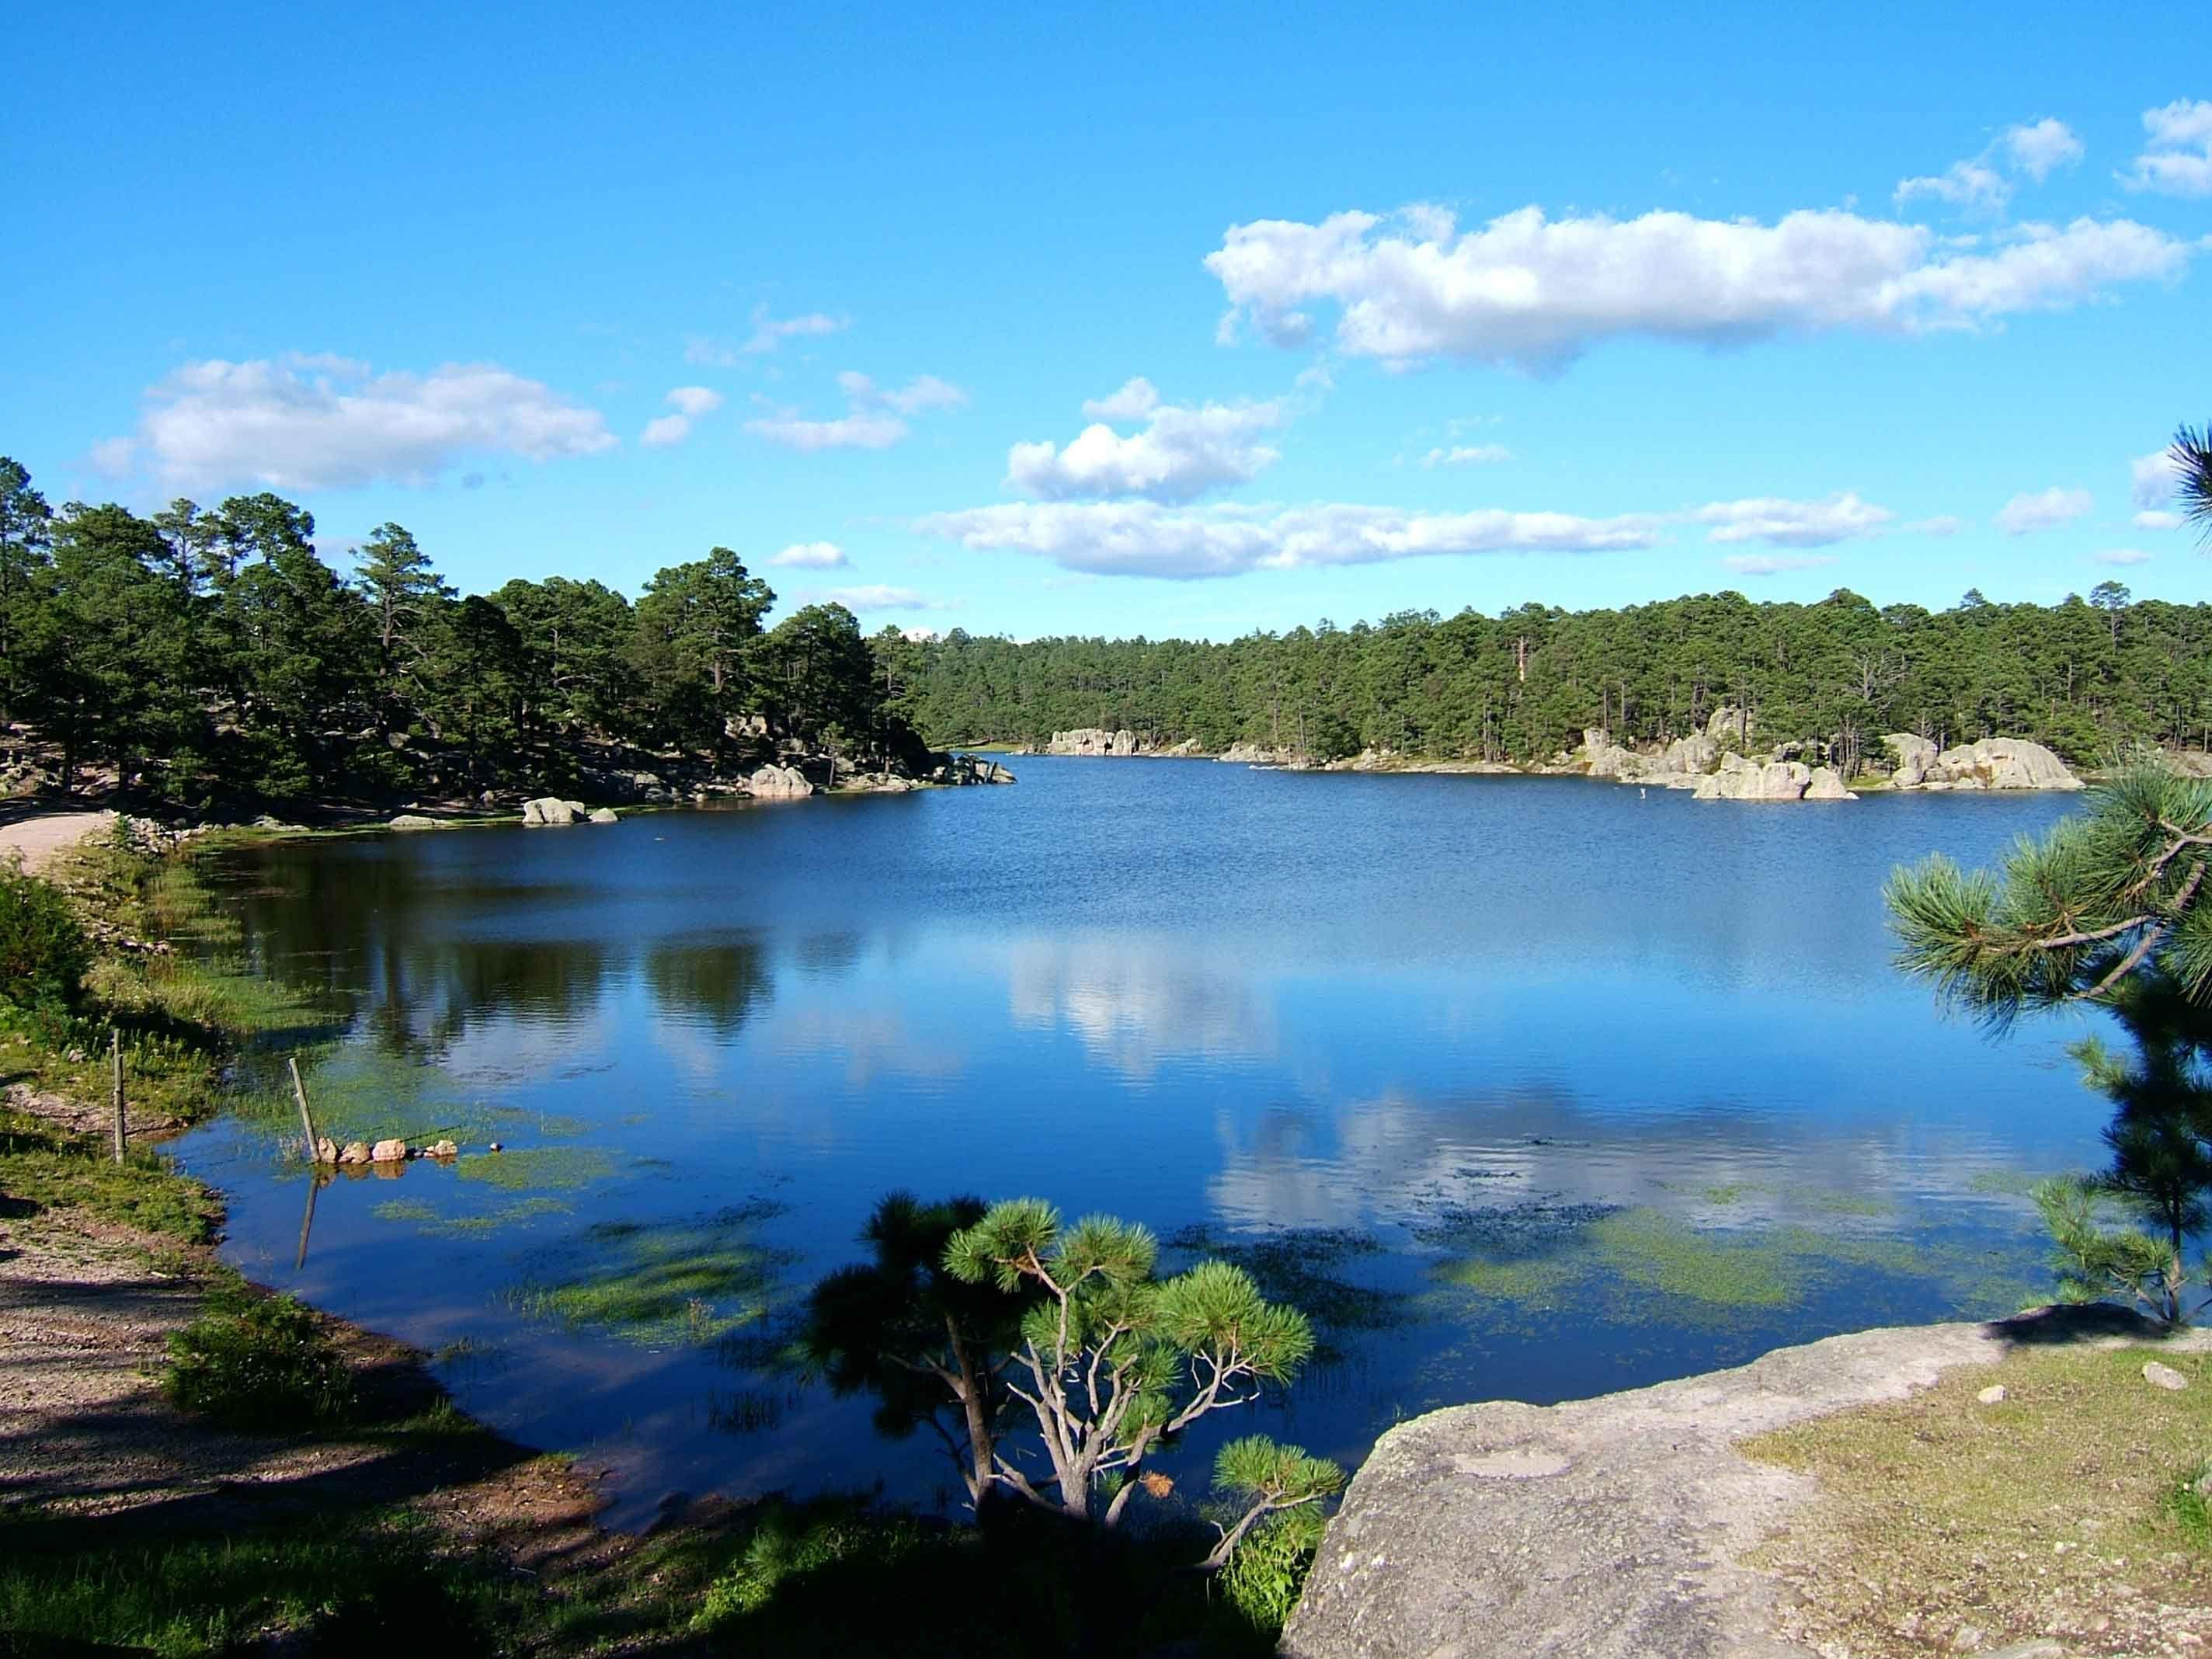 Paisajes b blicos para pantalla de hermosos paisajes for Fondos de pantalla 7 maravillas del mundo